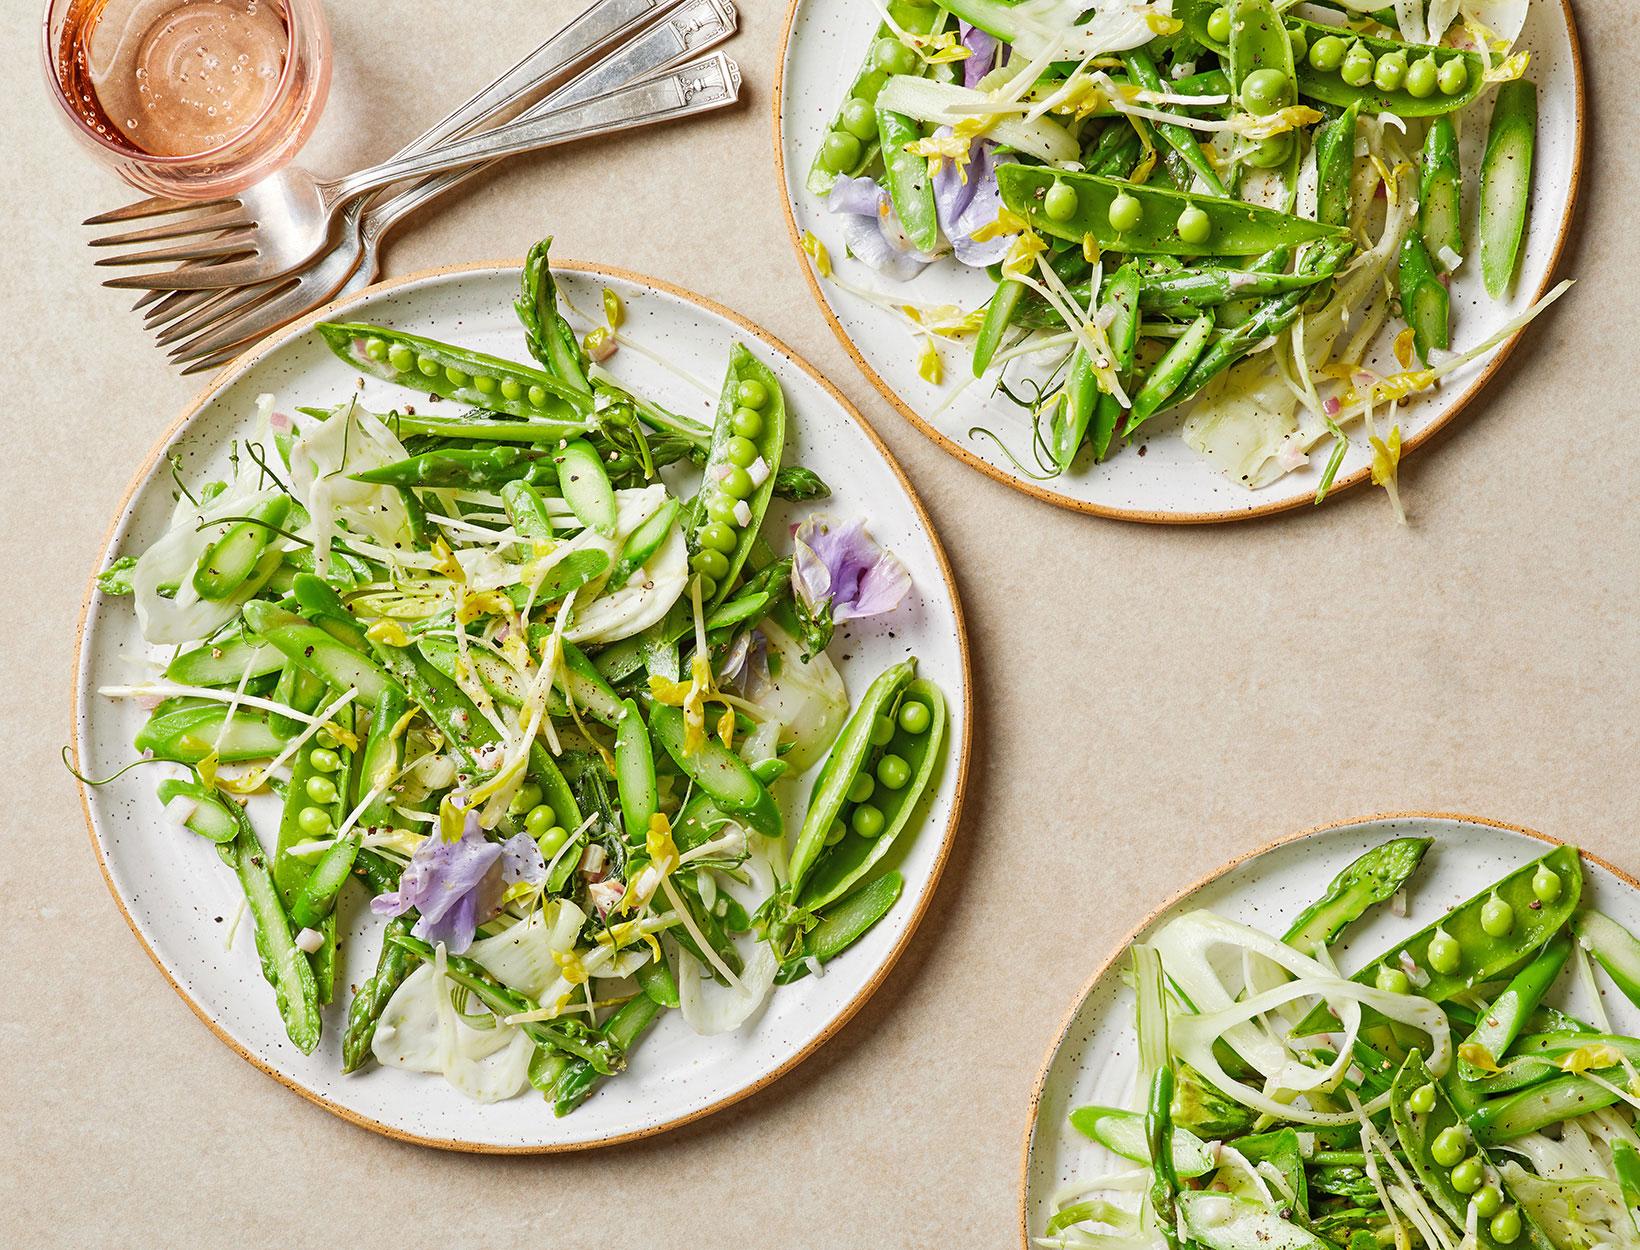 Snap Pea and Asparagus Salad with HorseradishDressing